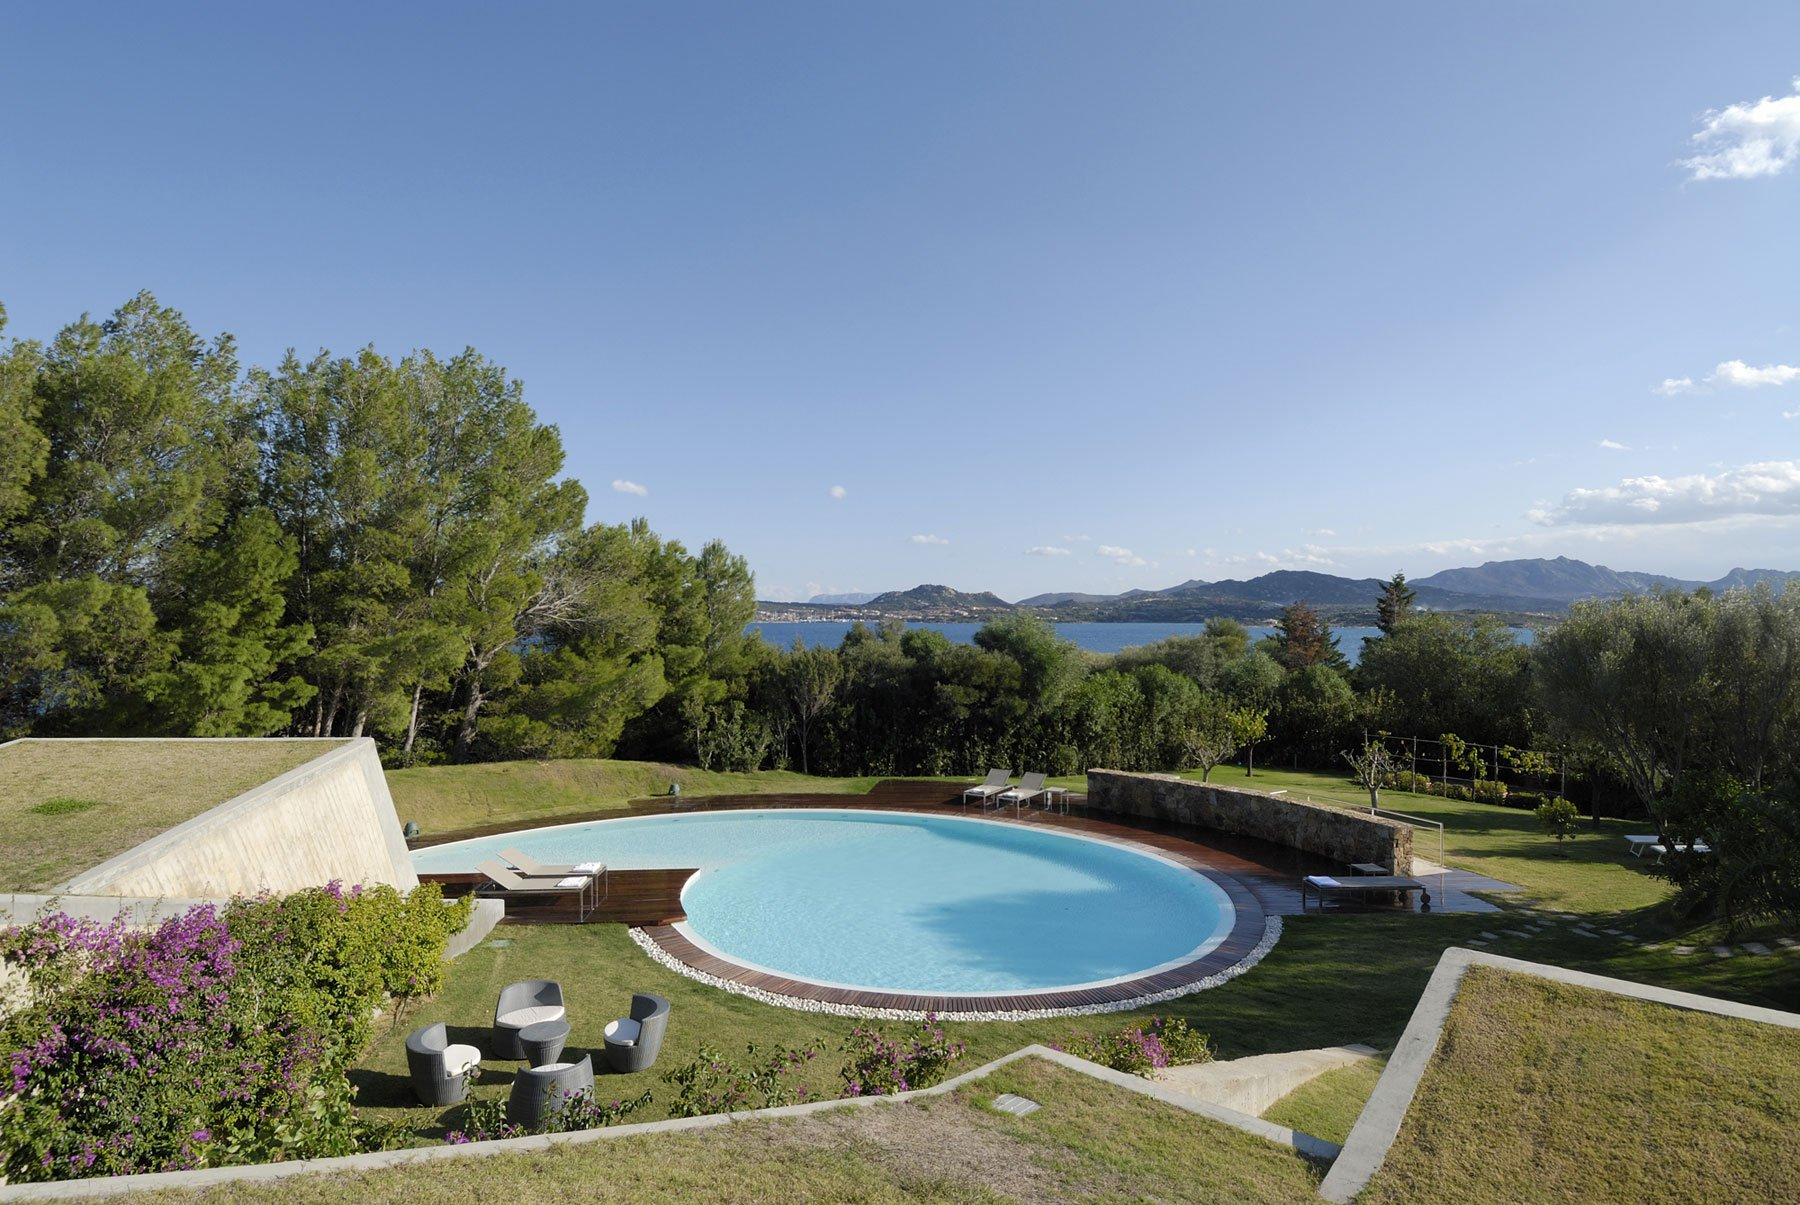 House-in-Sardinia-02